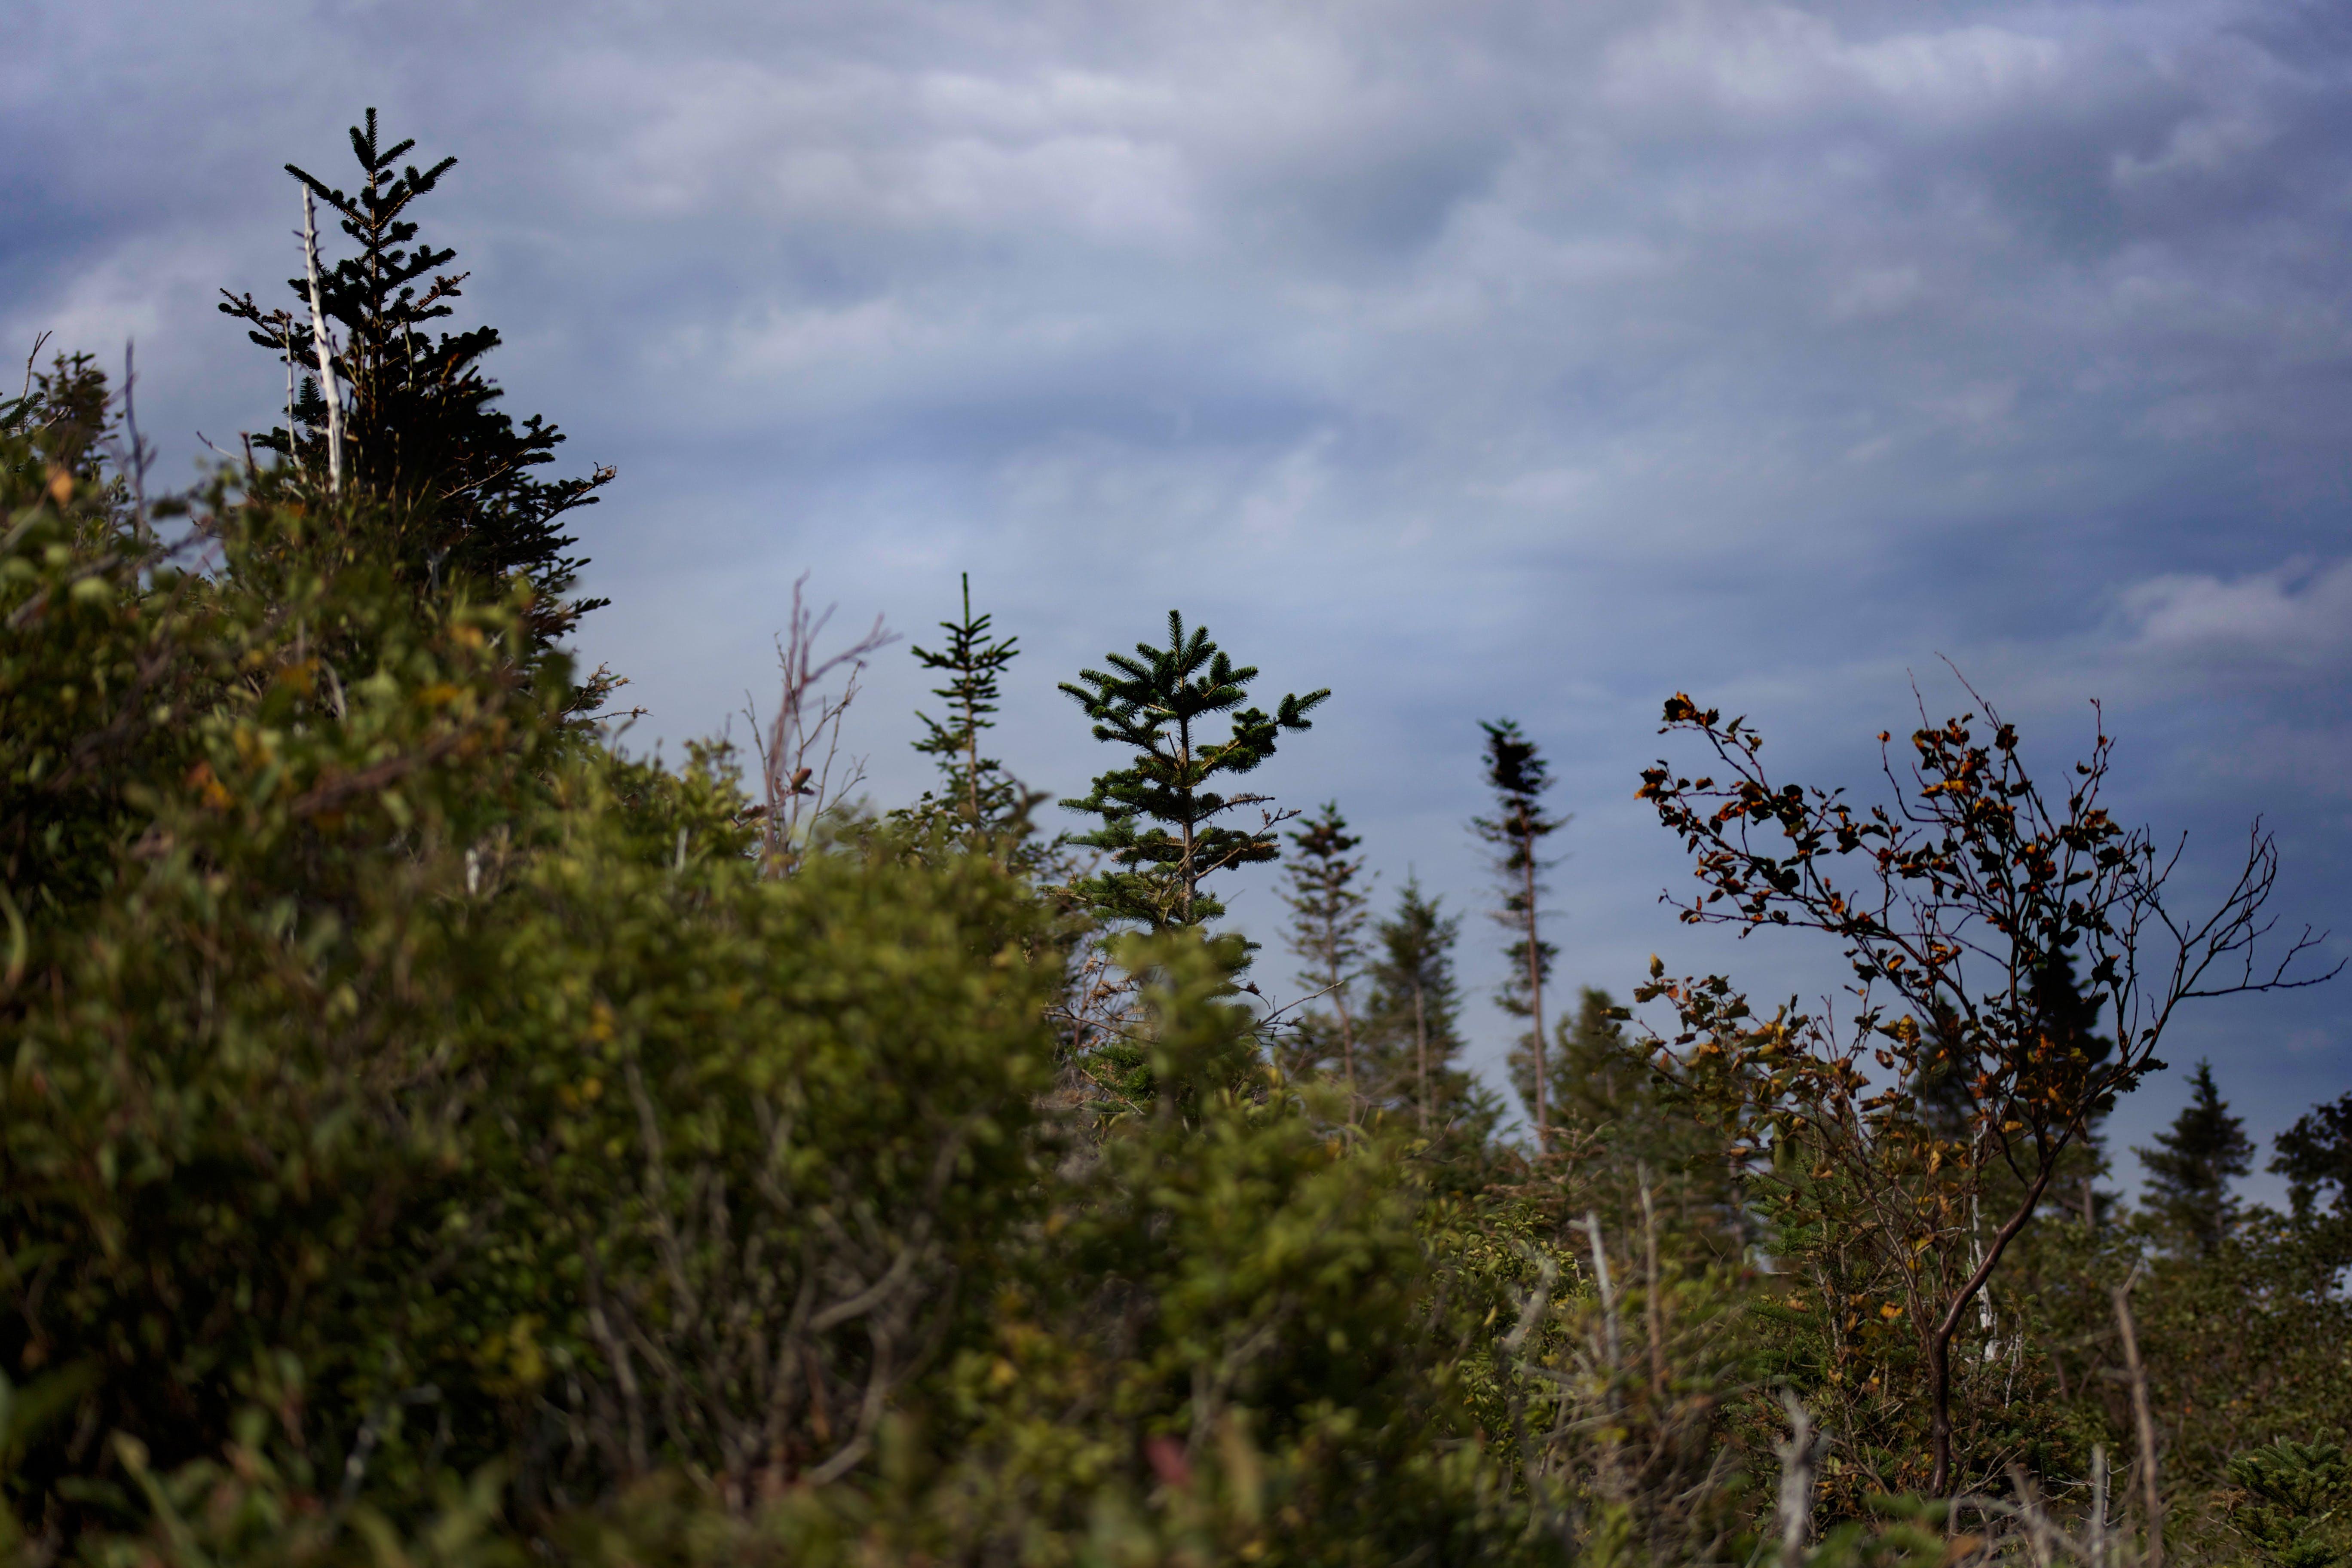 Kostenloses Stock Foto zu natur, himmel, wolken, bäume